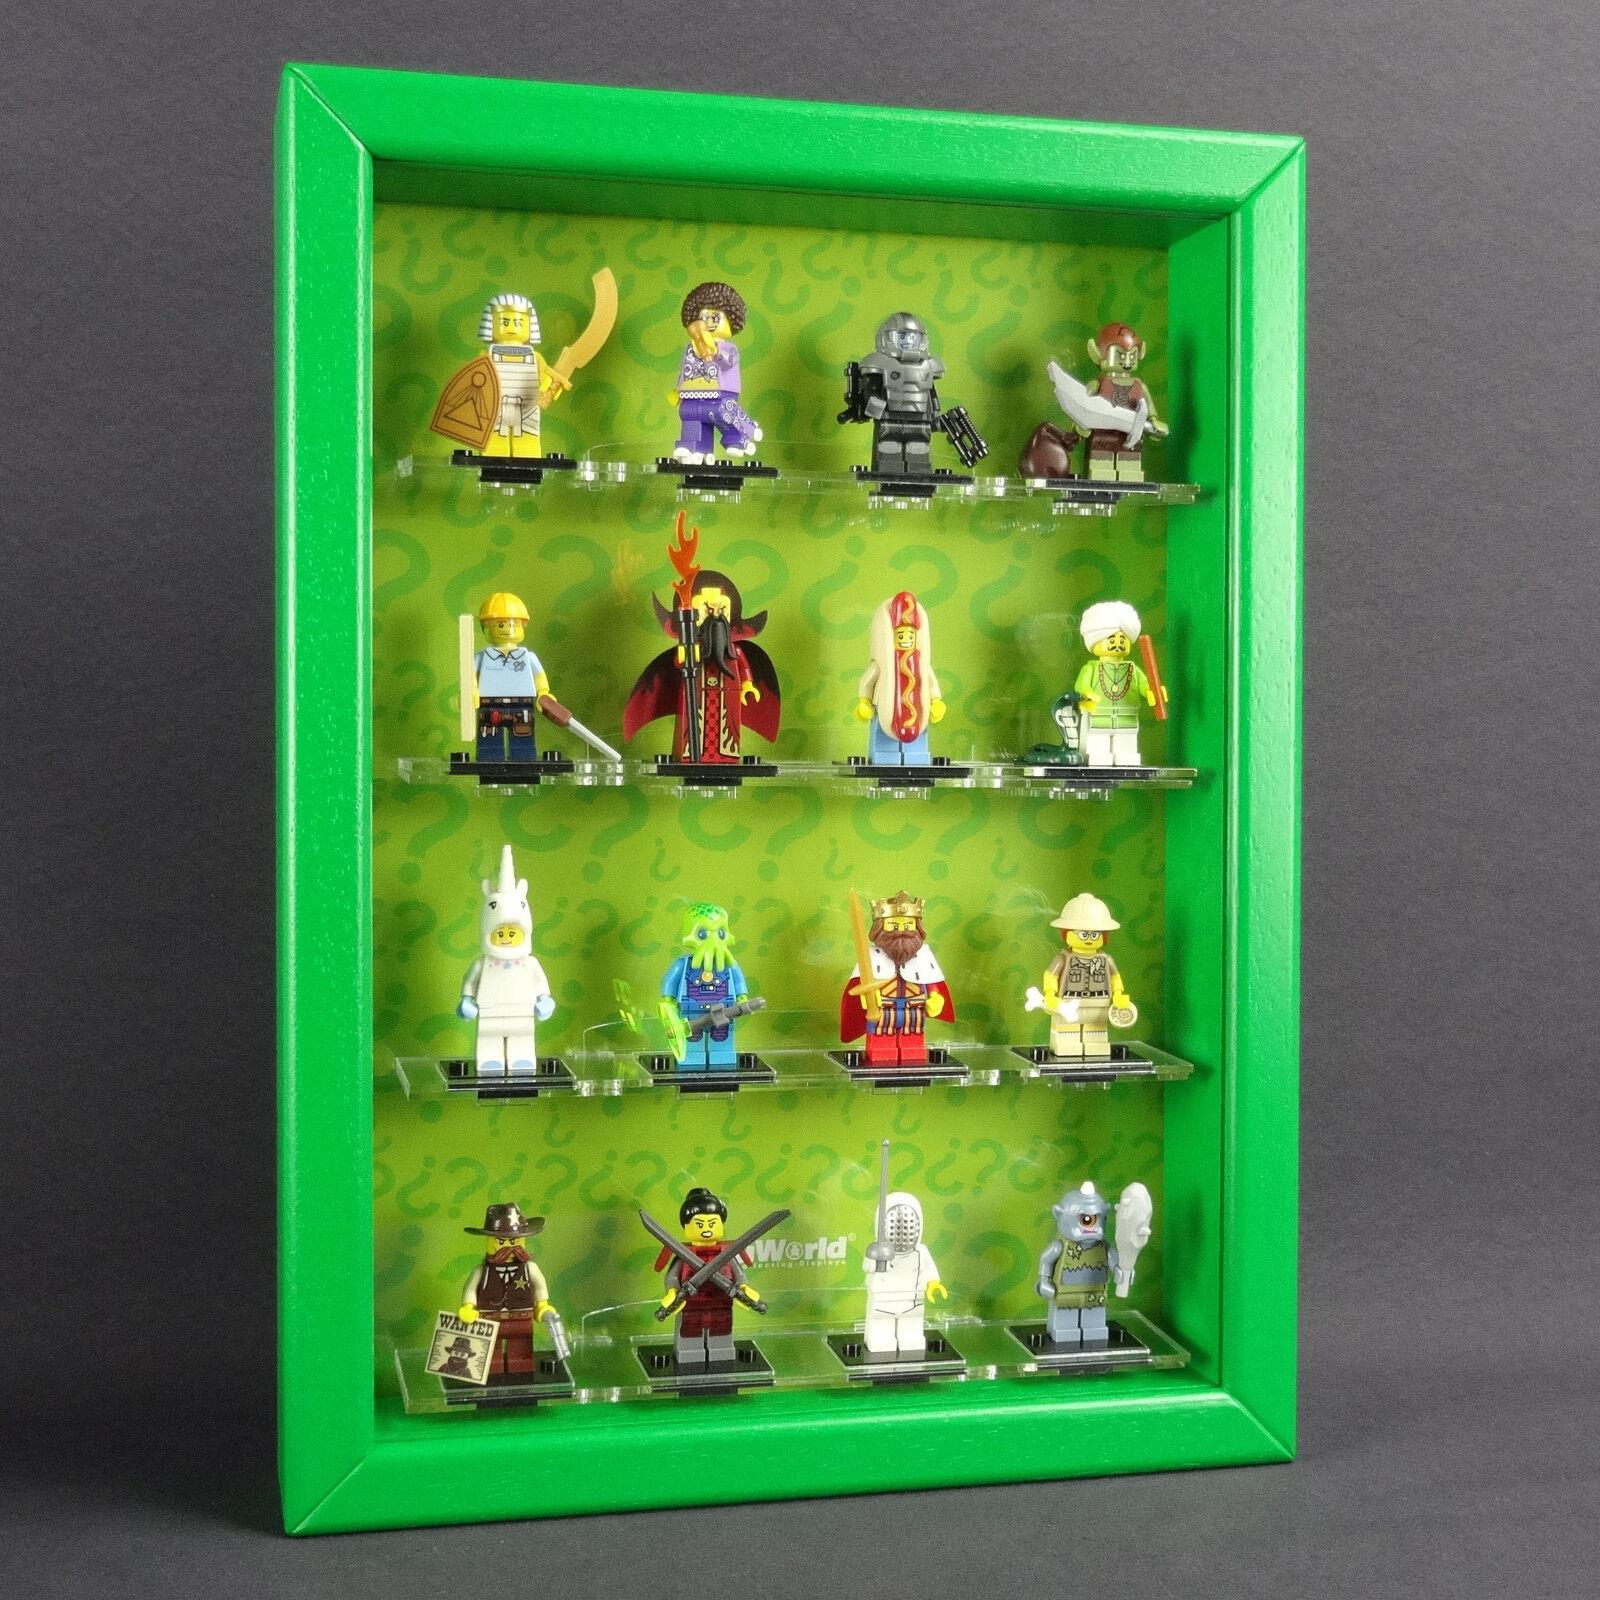 Figucase Sammelvitrine für LEGO® Serie 71008 minifigures Serie 13 Vitrine